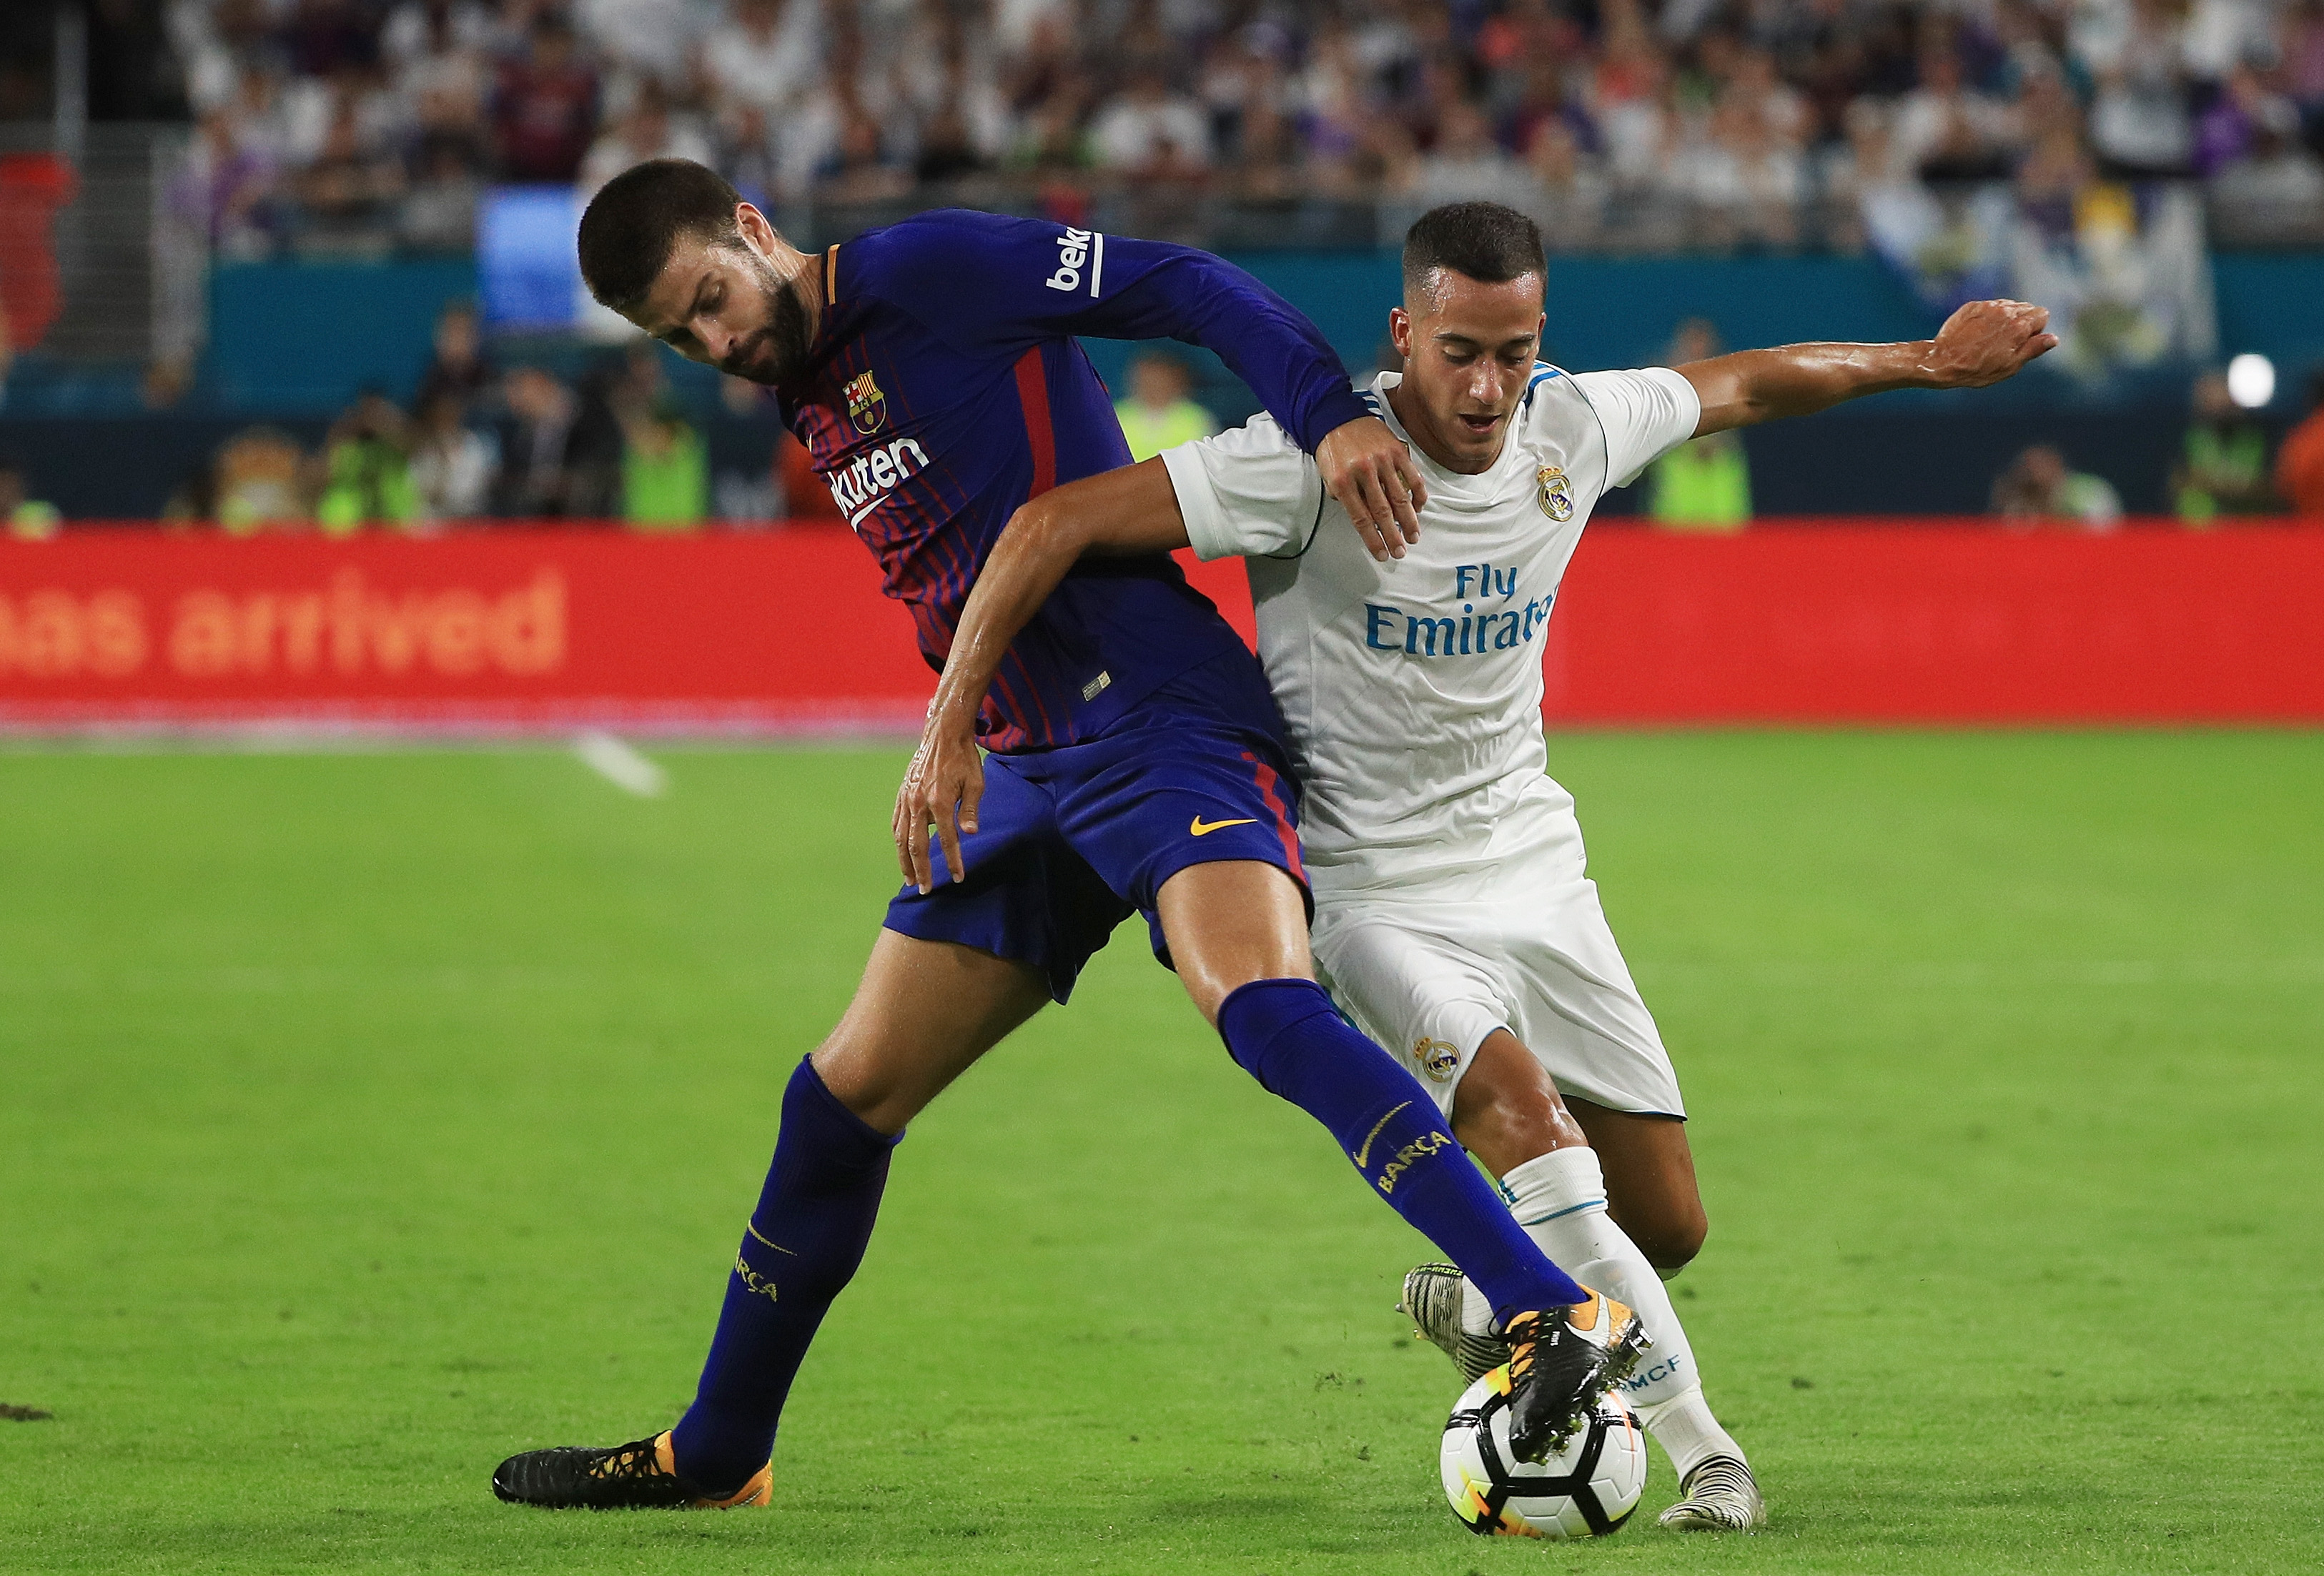 barcelona vs real madrid - photo #42